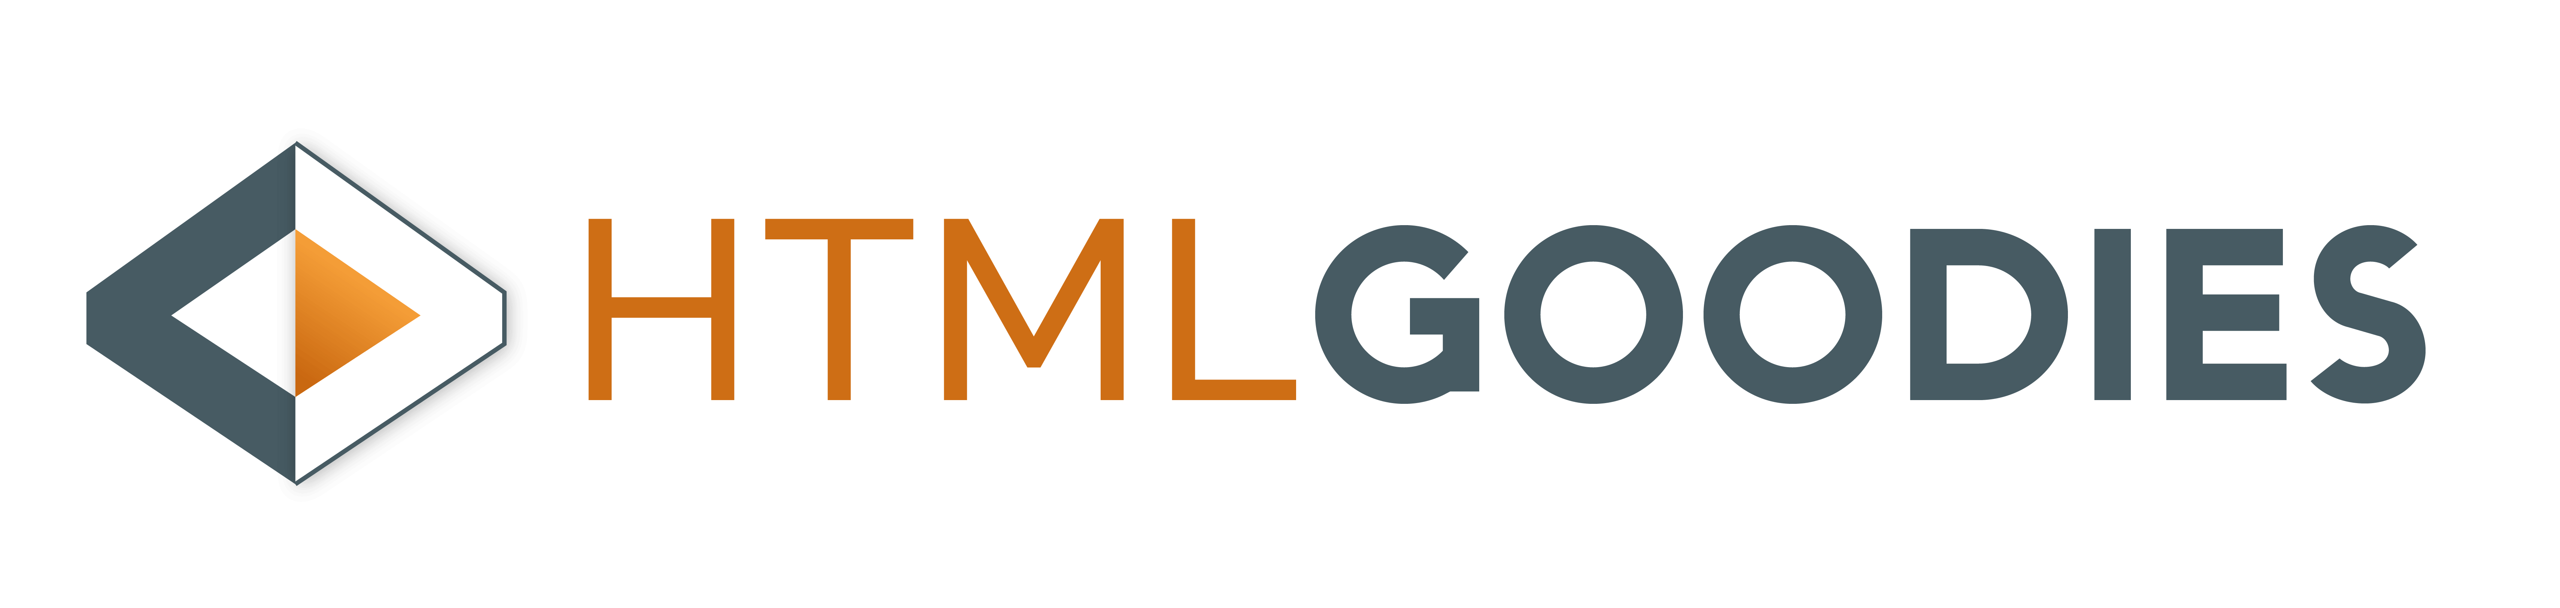 HTML Goodies